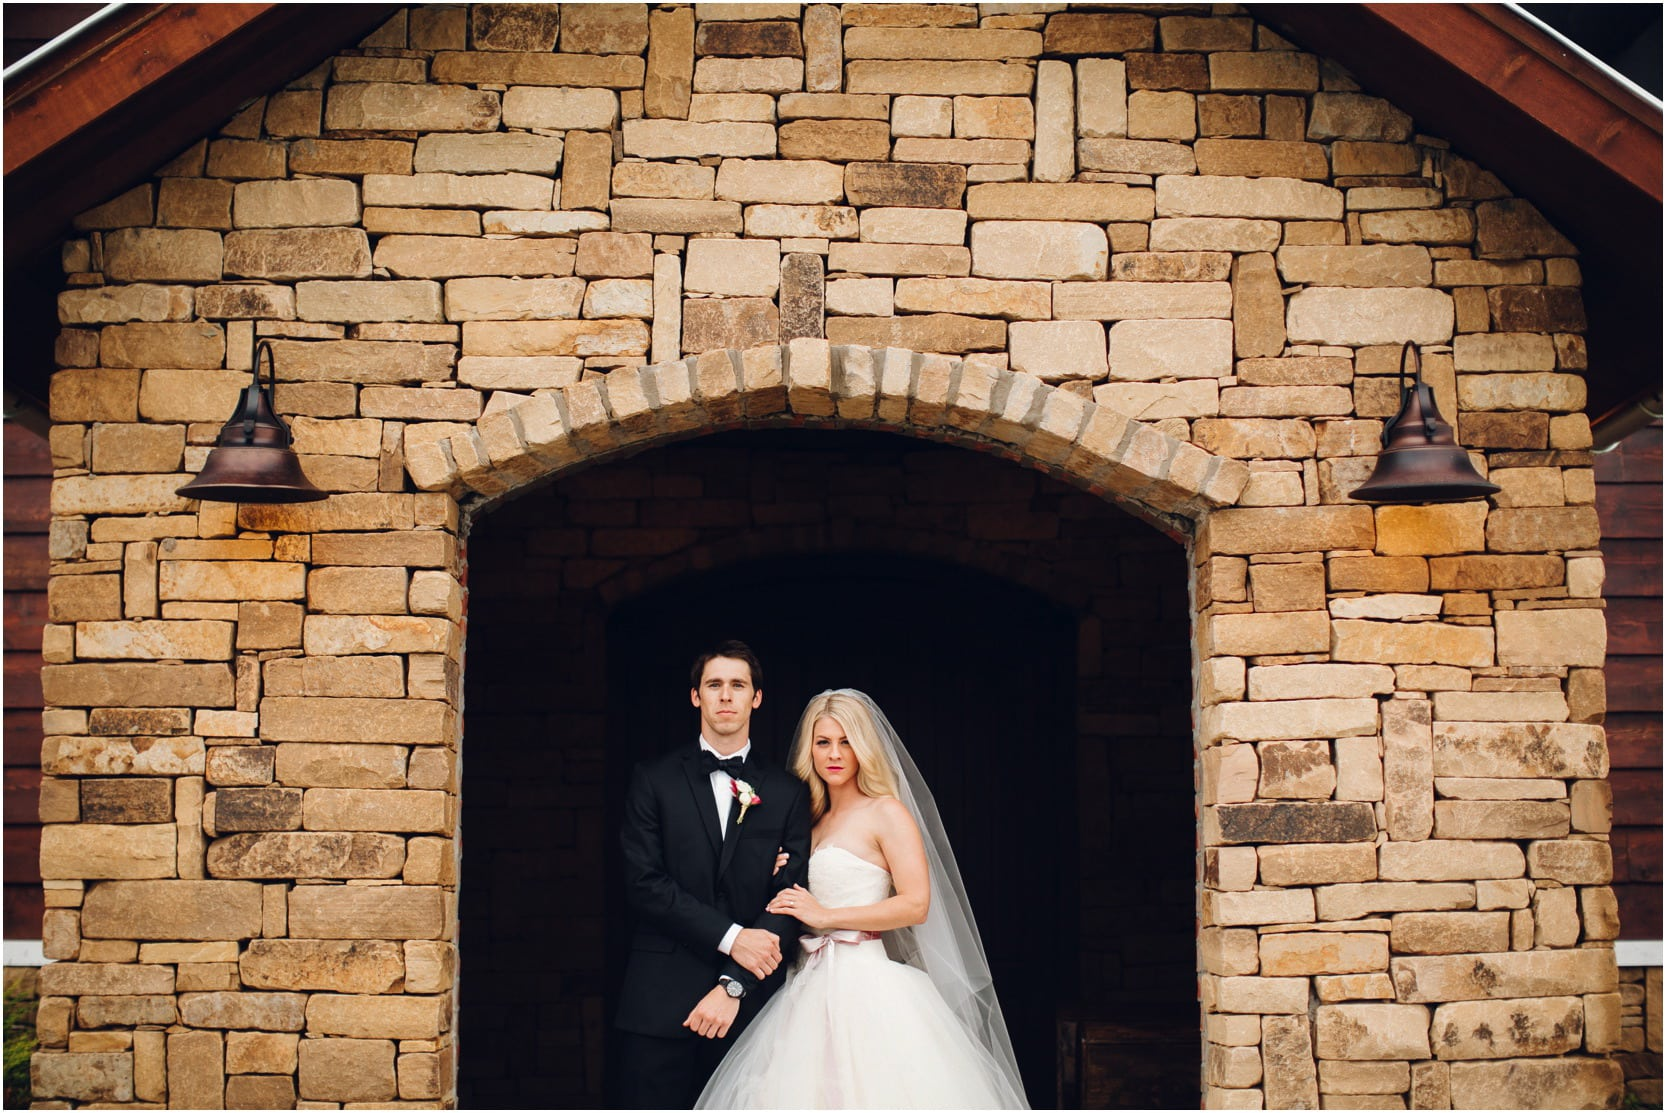 coderhillengburg_oklahoma_wedding__438_blogstomped